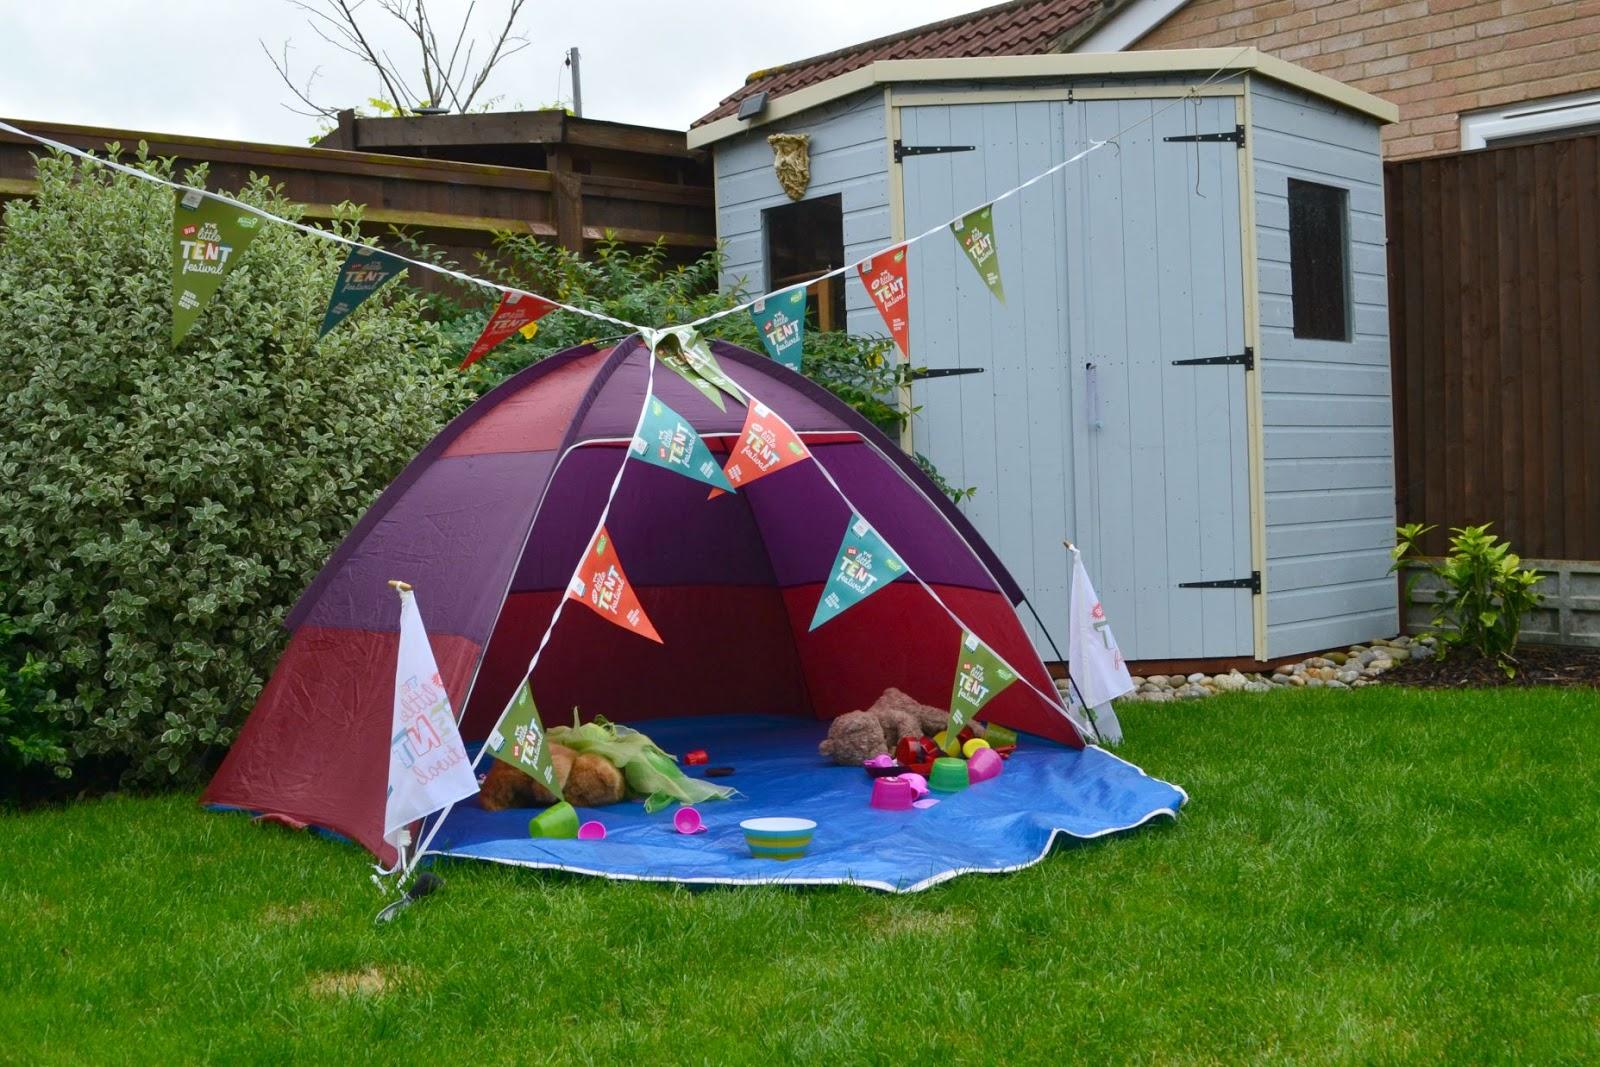 A tent an bunting in garden & Our garden festival #biglittletentfestival15 - Tin Box Traveller